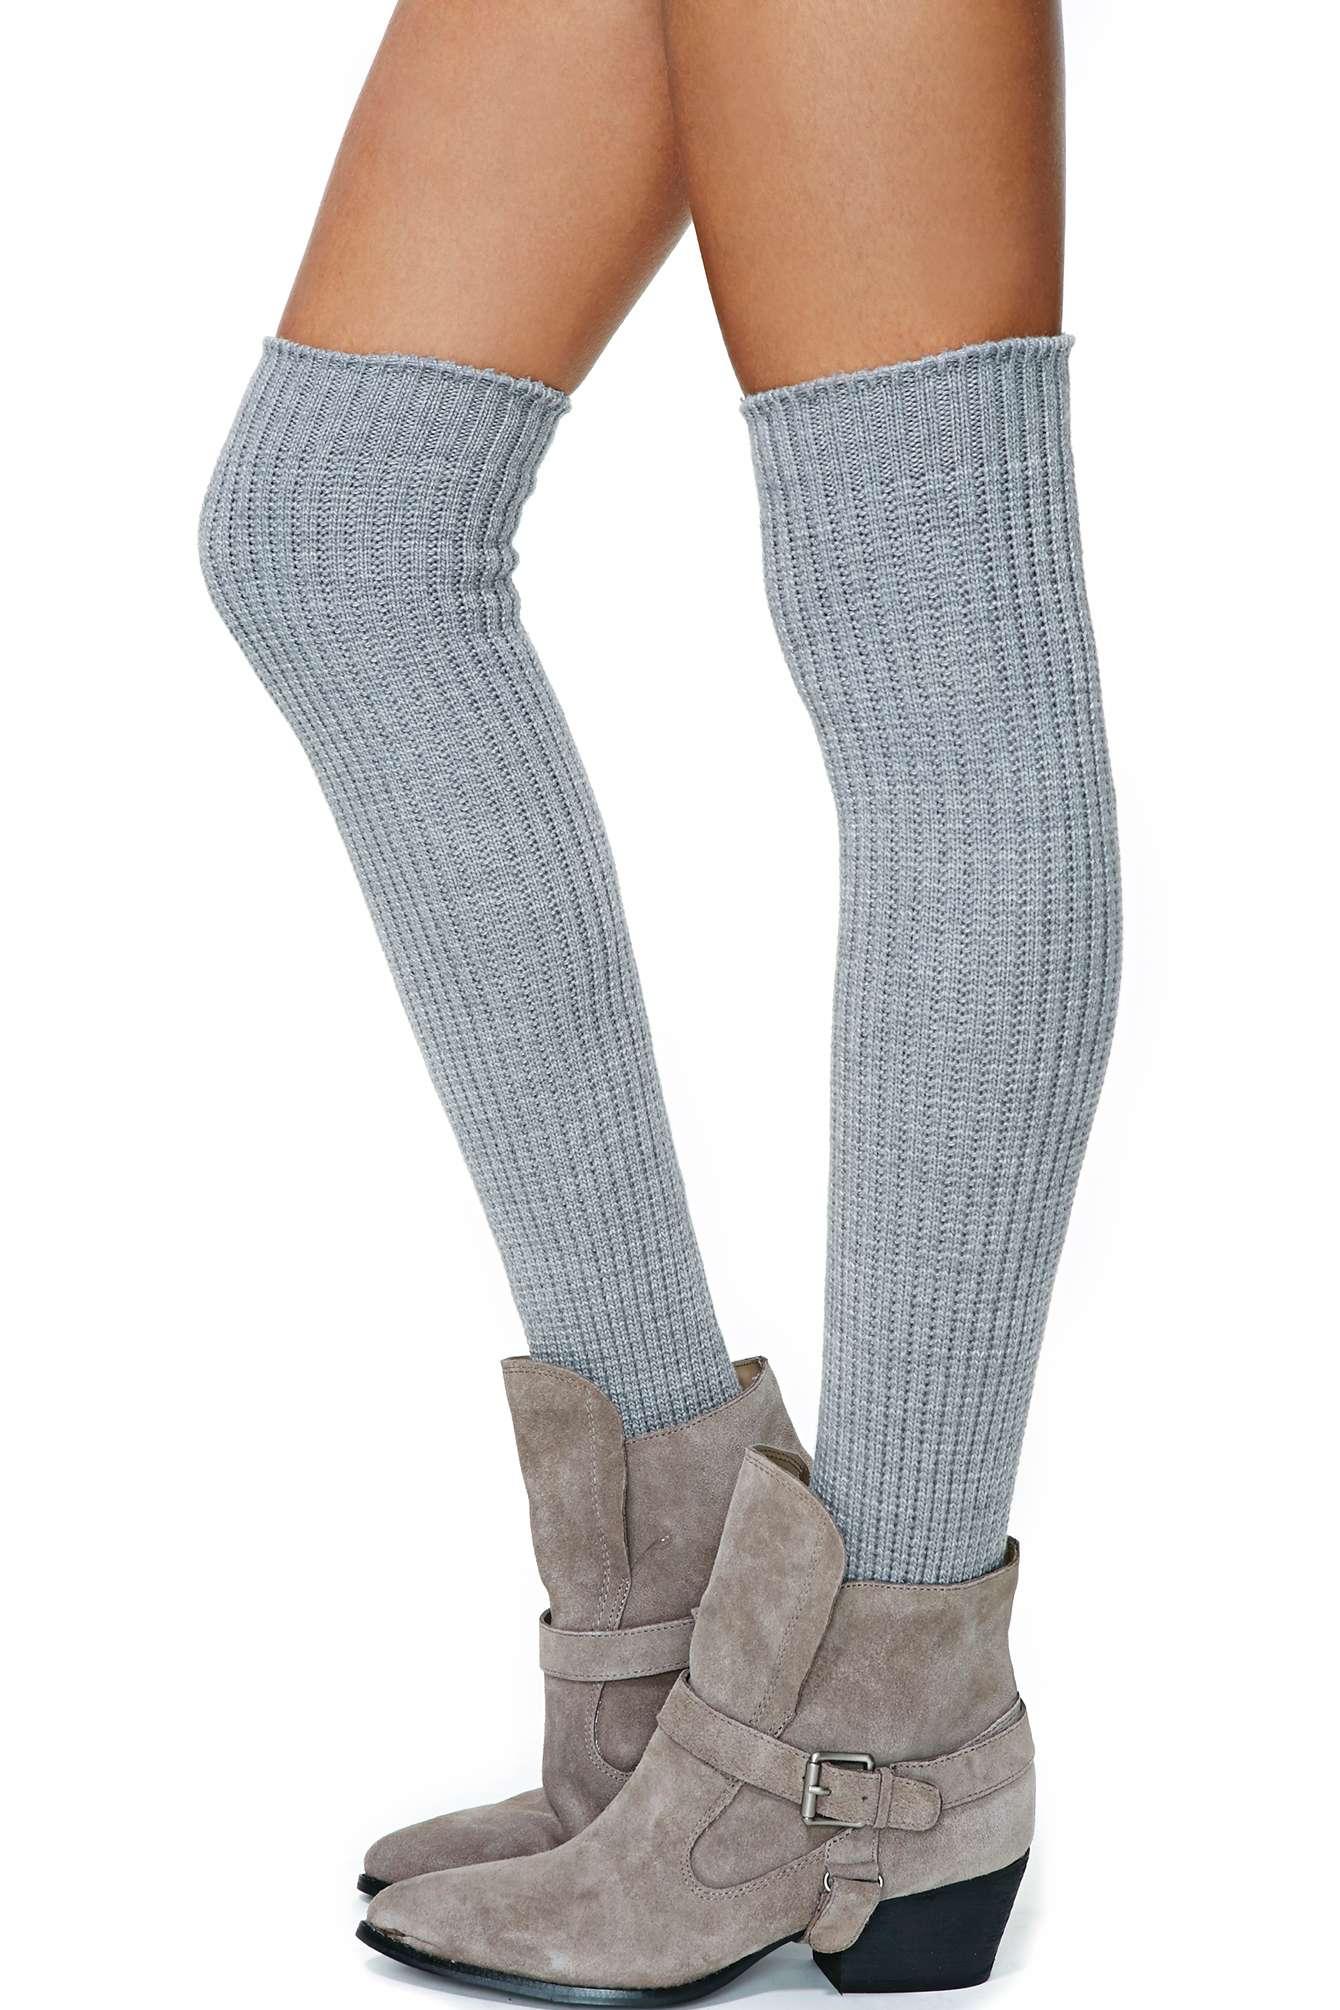 Nasty Gal Cloudy Skies Thigh High Socks in Gray | Lyst